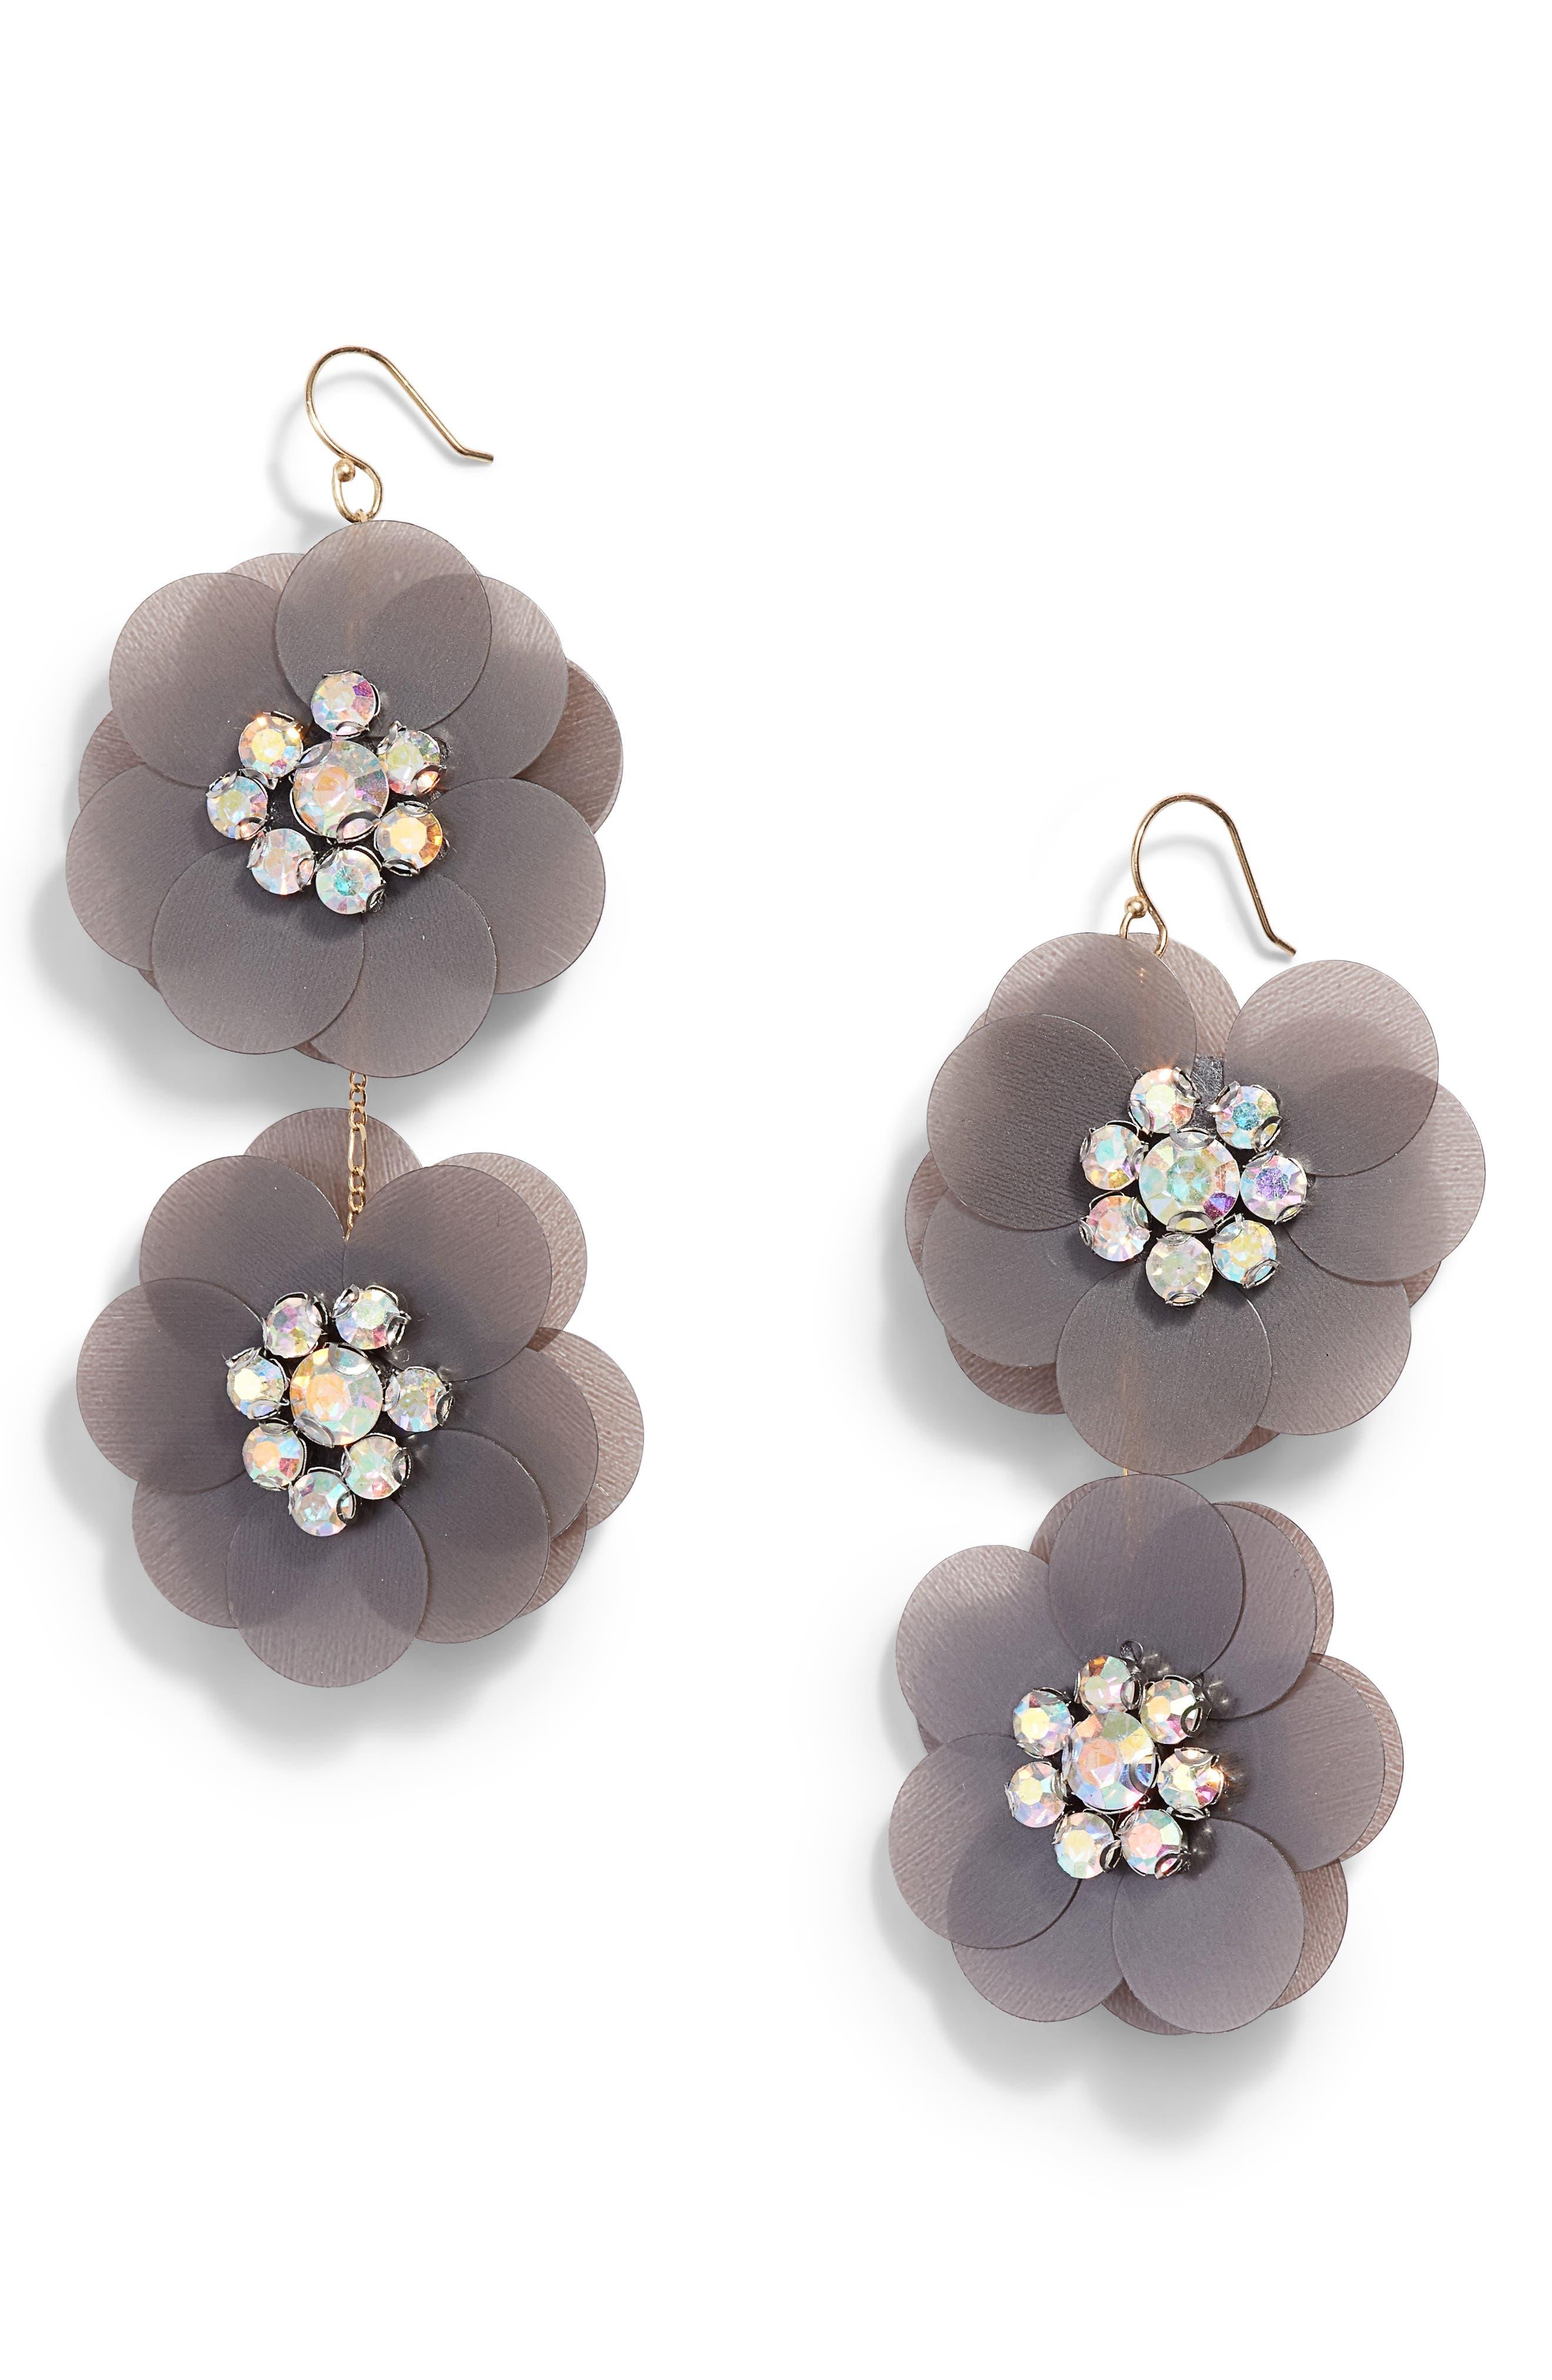 SEREFINA Sequin Flowers Drop Earrings in Grey